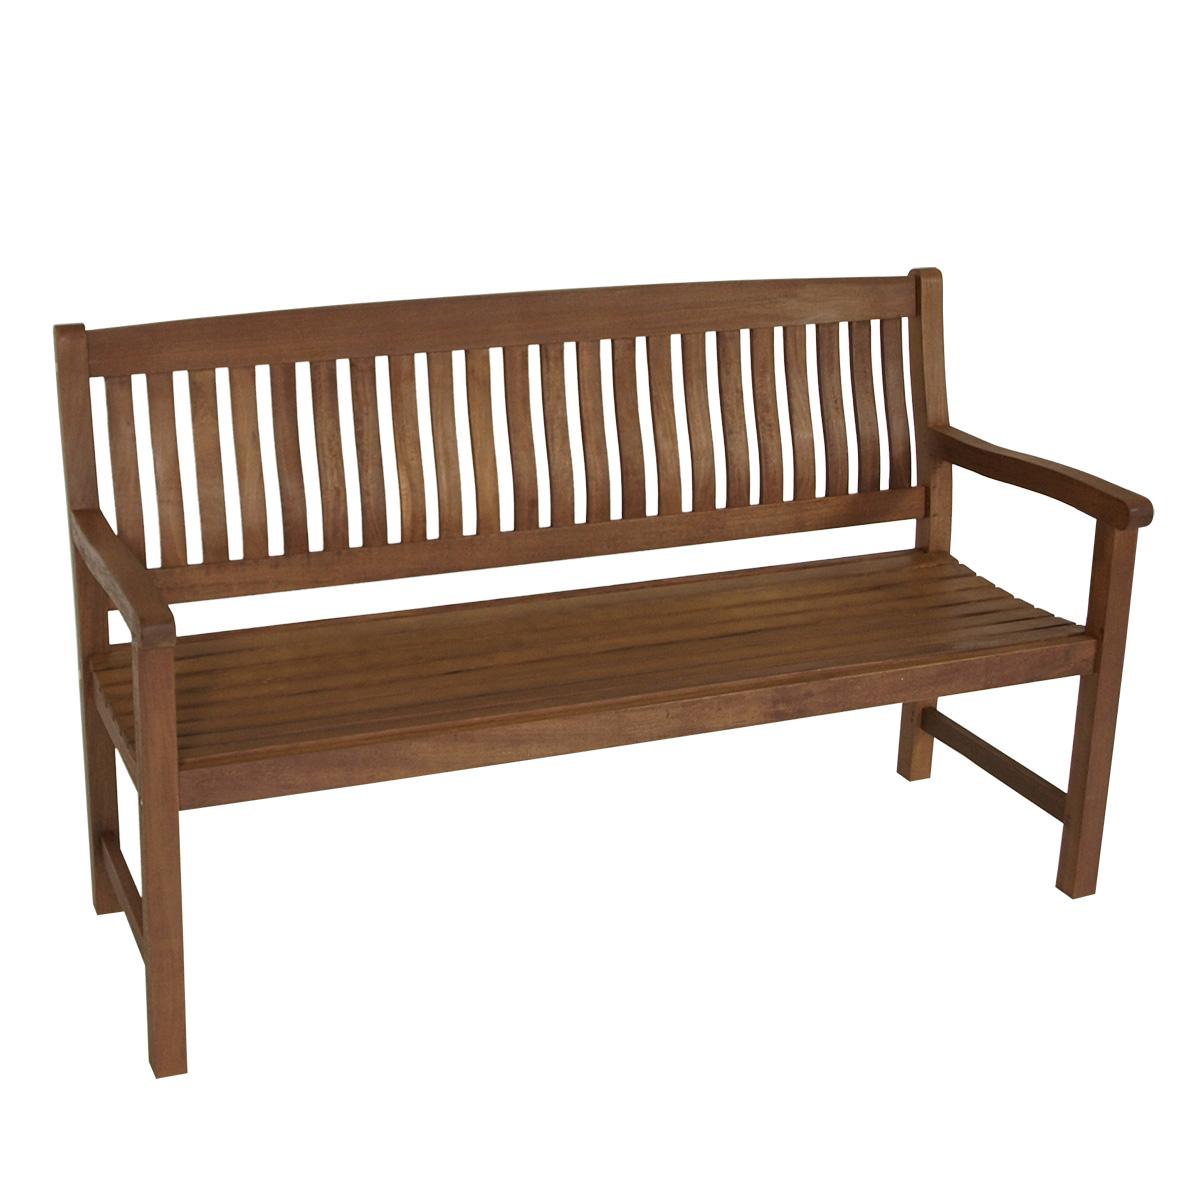 edle gartenbank holzbank parkbank manaus aus eukalyputs 3. Black Bedroom Furniture Sets. Home Design Ideas